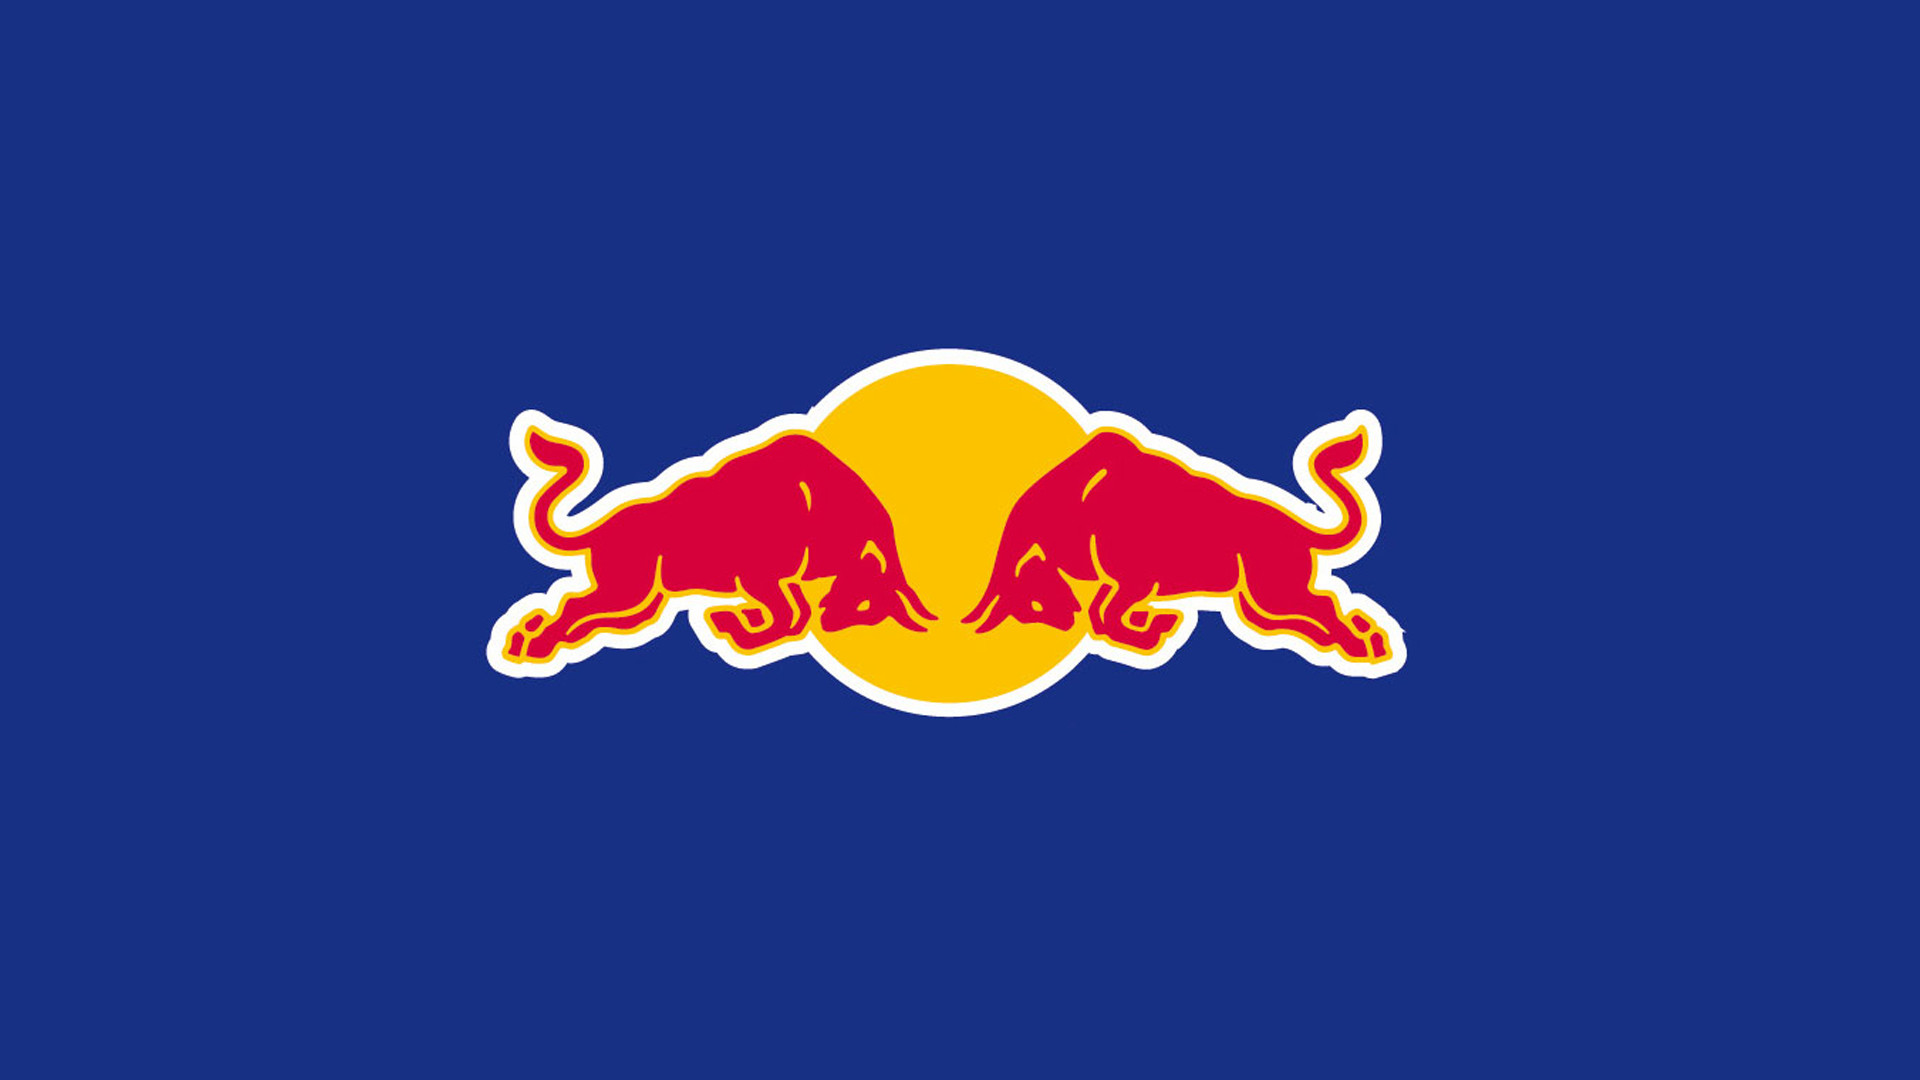 1920x1080 Wallpaperwiki Red Bull Logo Desktop Wallpaper PIC